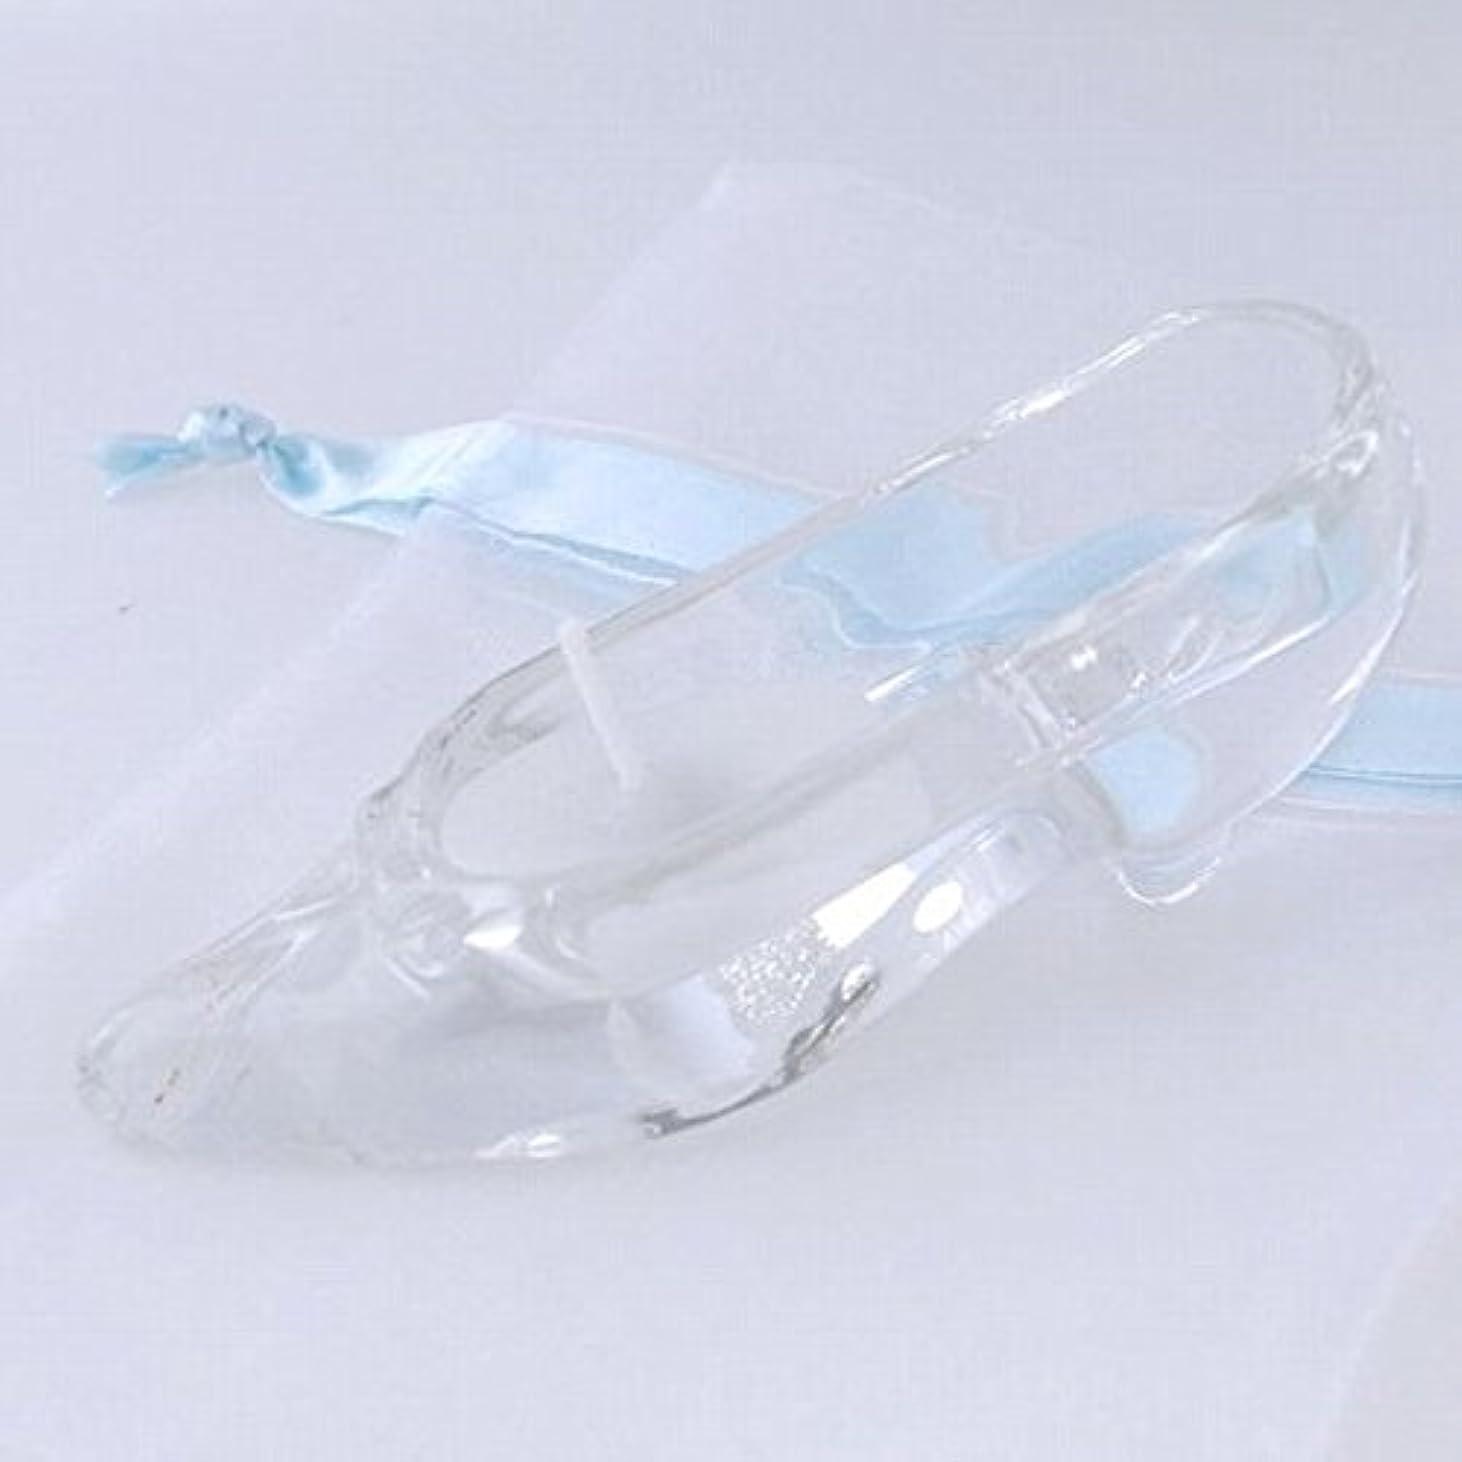 kameyama candle(カメヤマキャンドル) ガラスの靴 「ホワイト」(A9510050W)